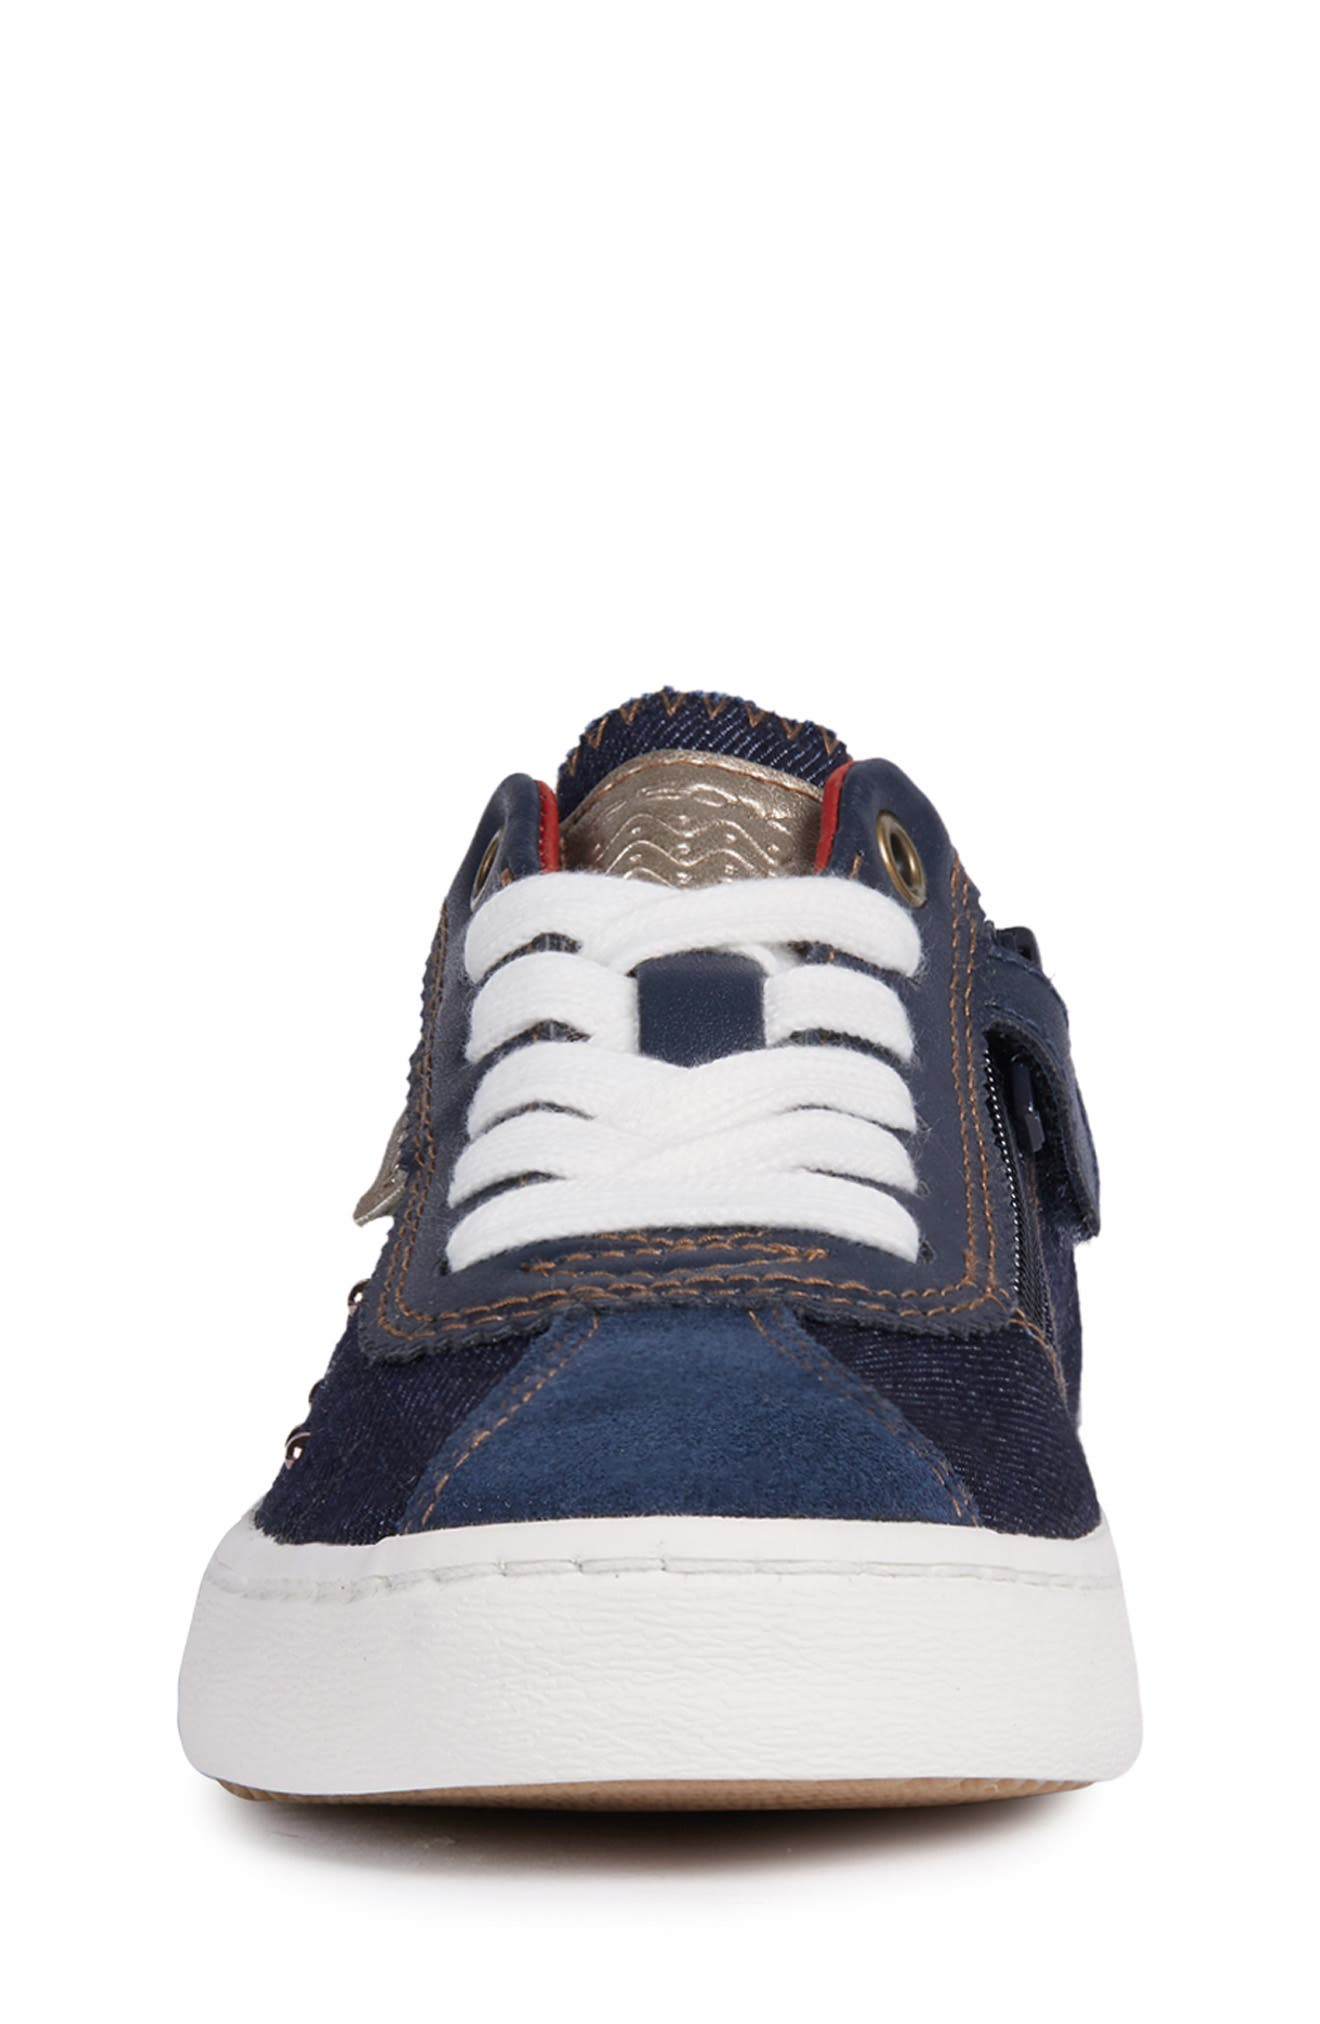 Kilwi Zip Low Top Sneaker,                             Alternate thumbnail 3, color,                             NAVY